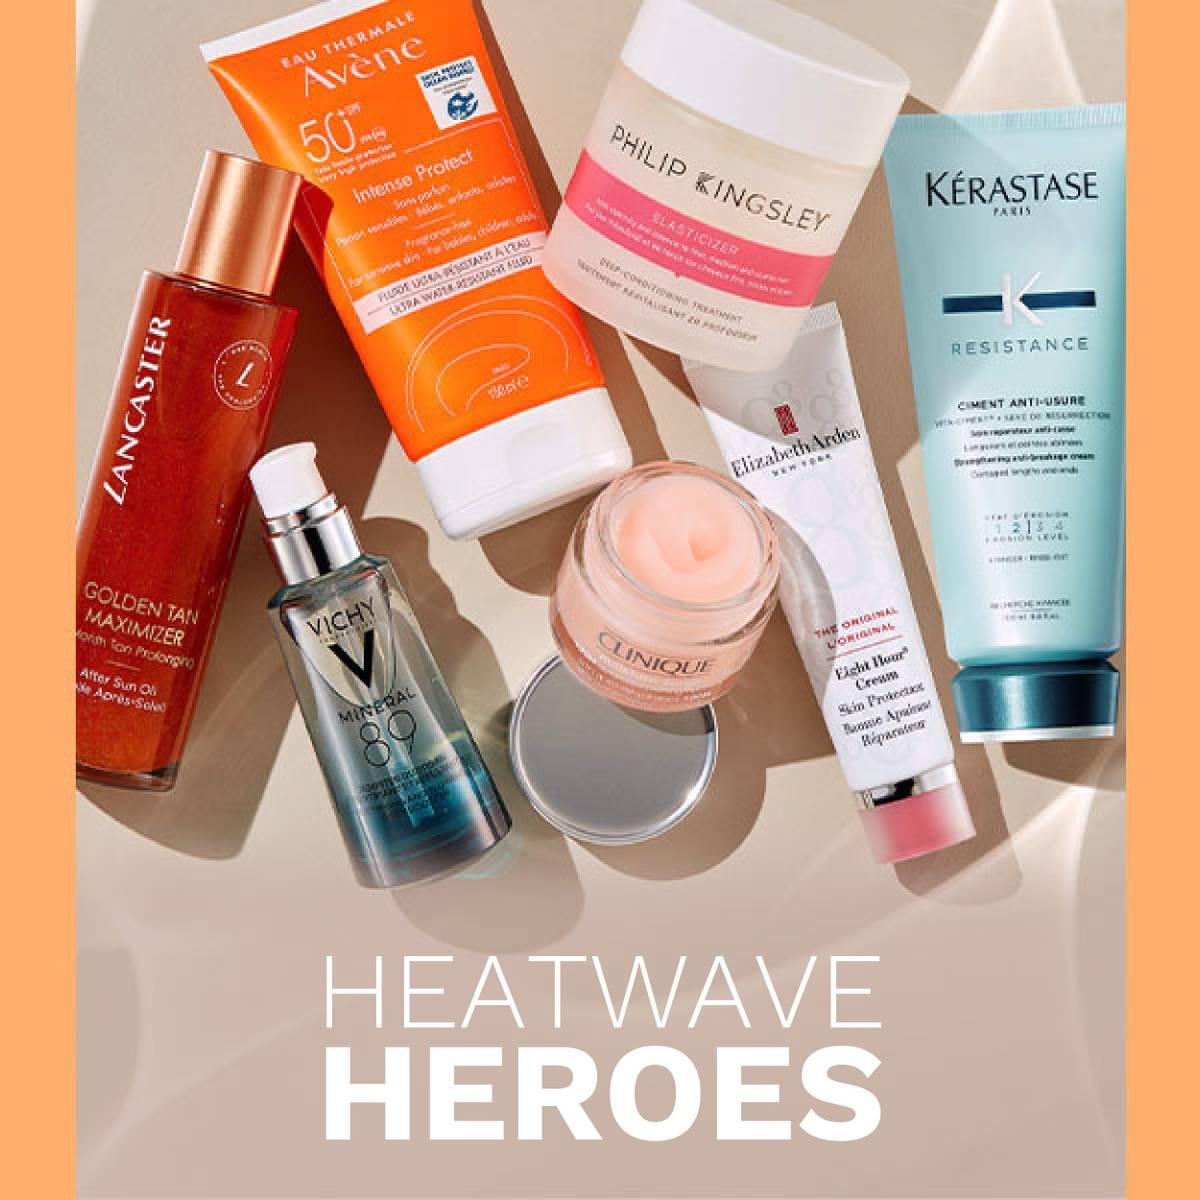 heatwave heroes